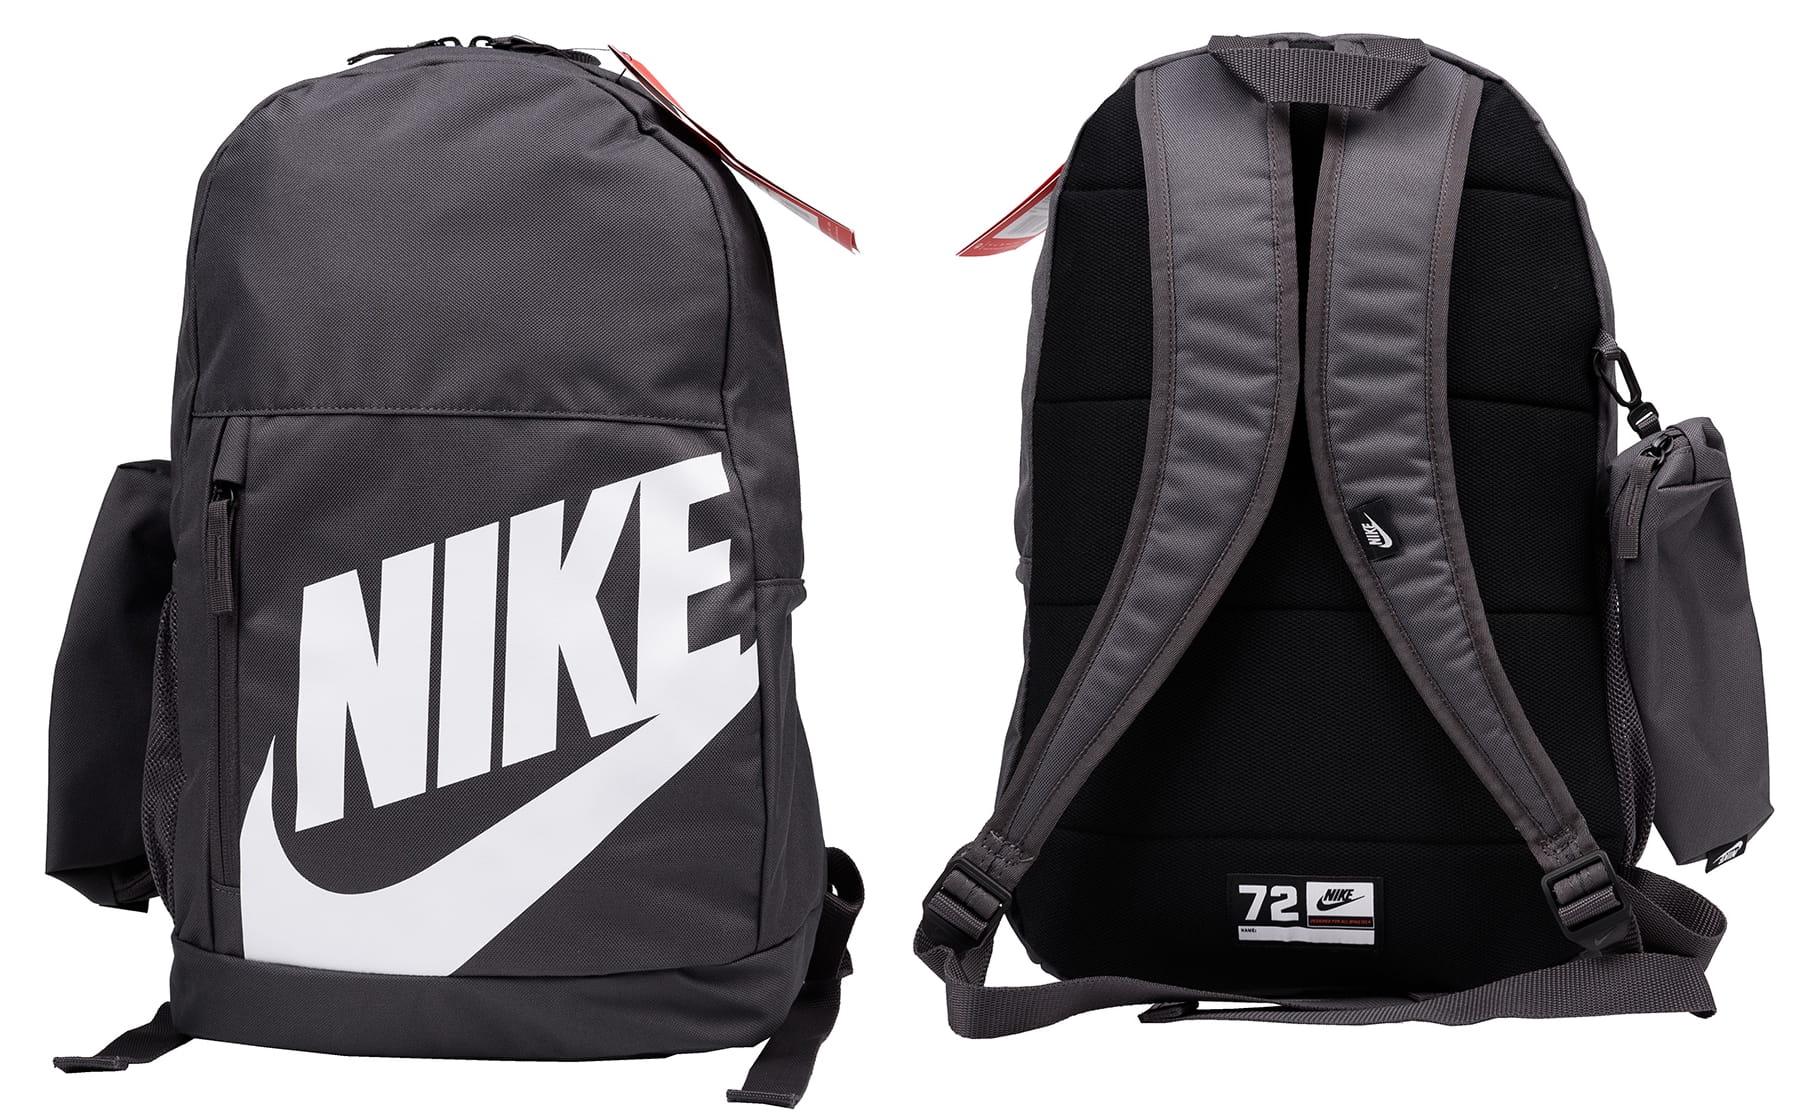 Details zu Rucksack Nike Elemental Nike Y Nk Elmntl Bkpk Fa19 Schulrucksack grau